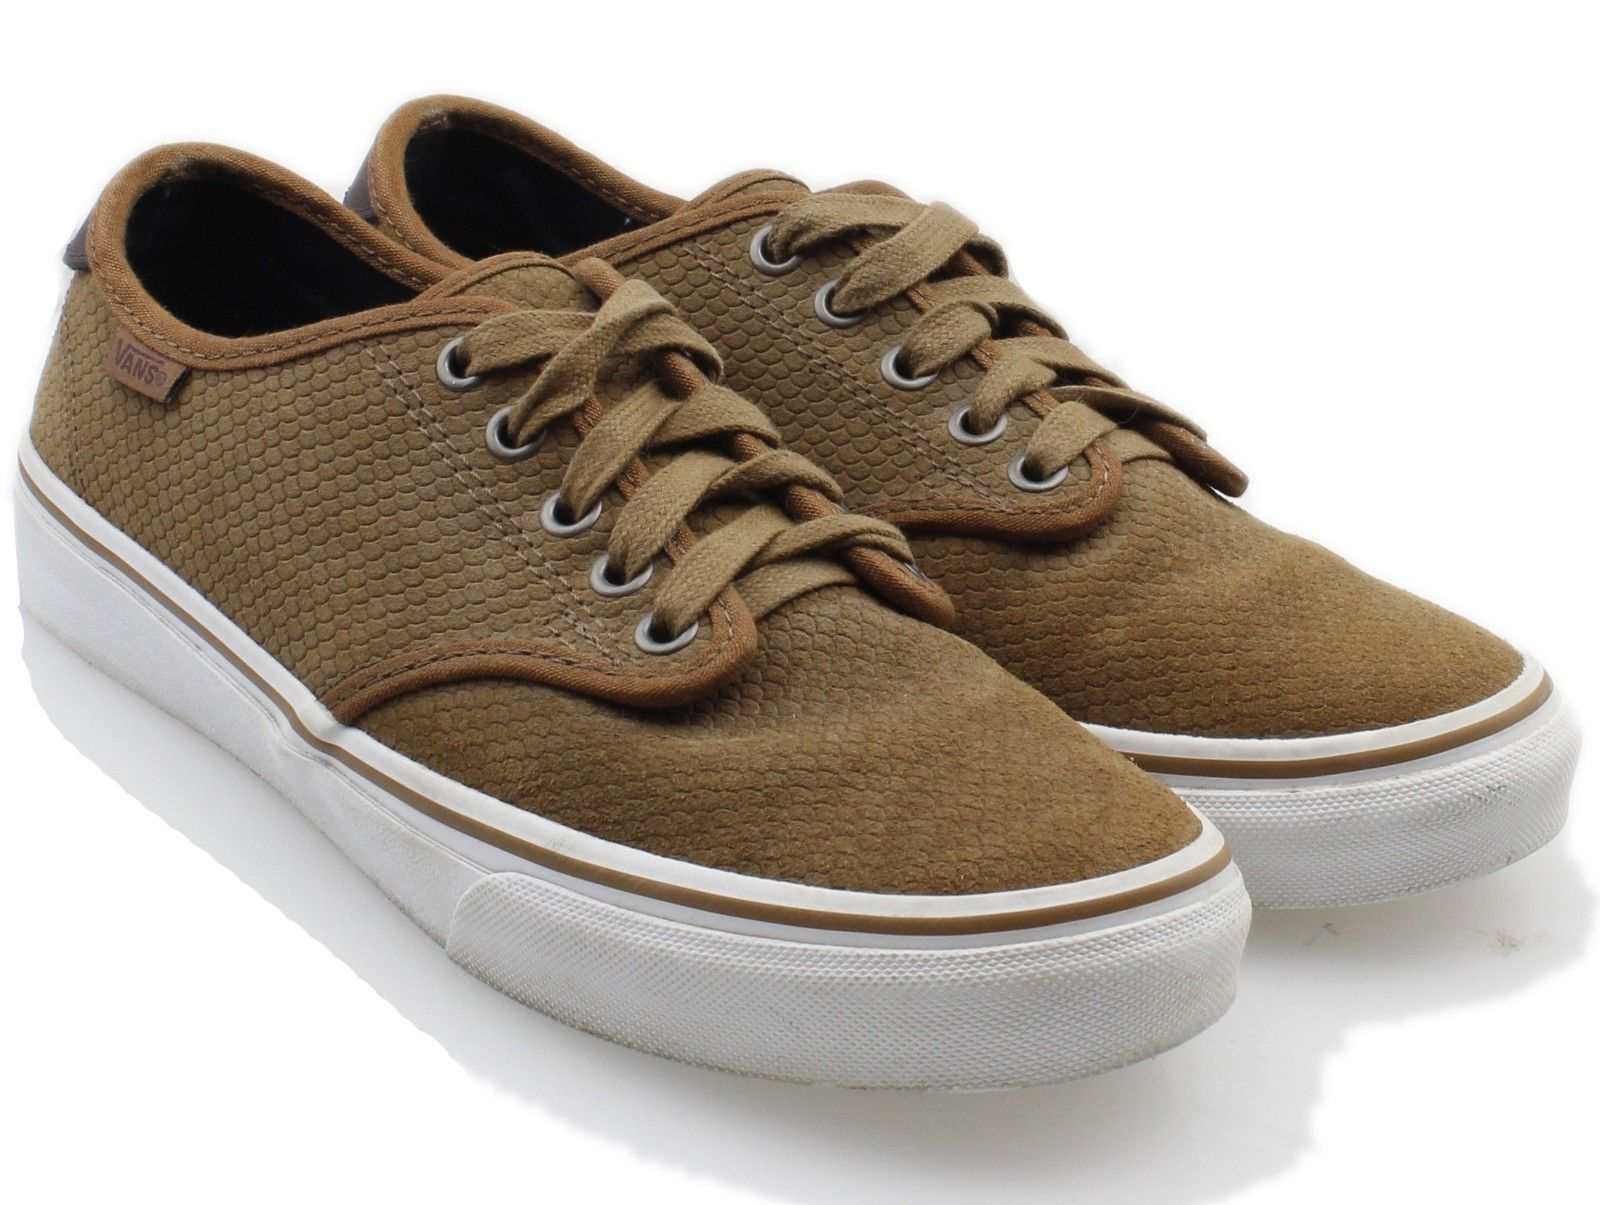 ef5274dae4c54e Vans Ultra Cush Womens Low Top Skating Shoes and 50 similar items